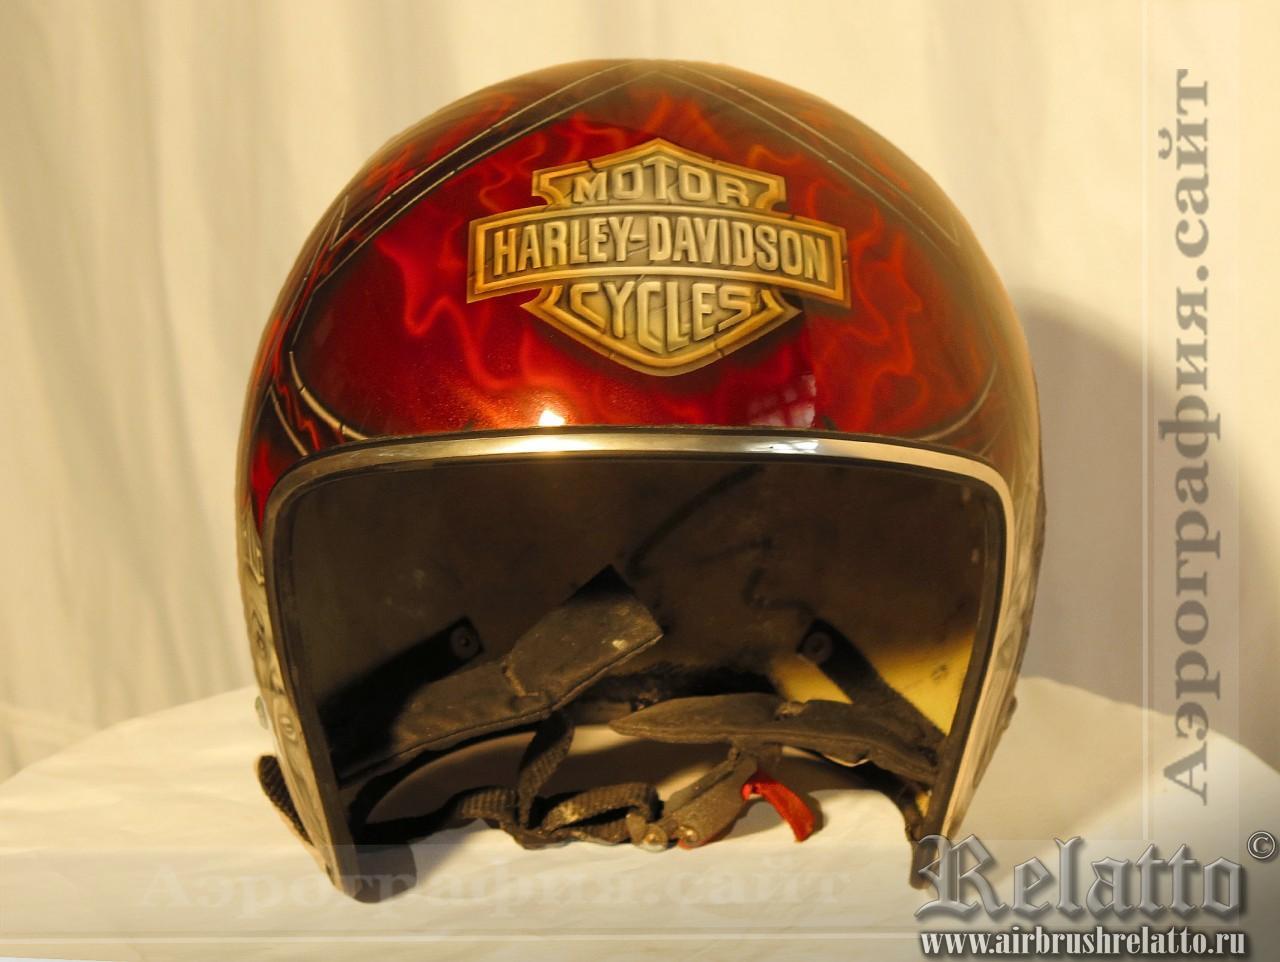 Аэрография шлемика Harley Davidson